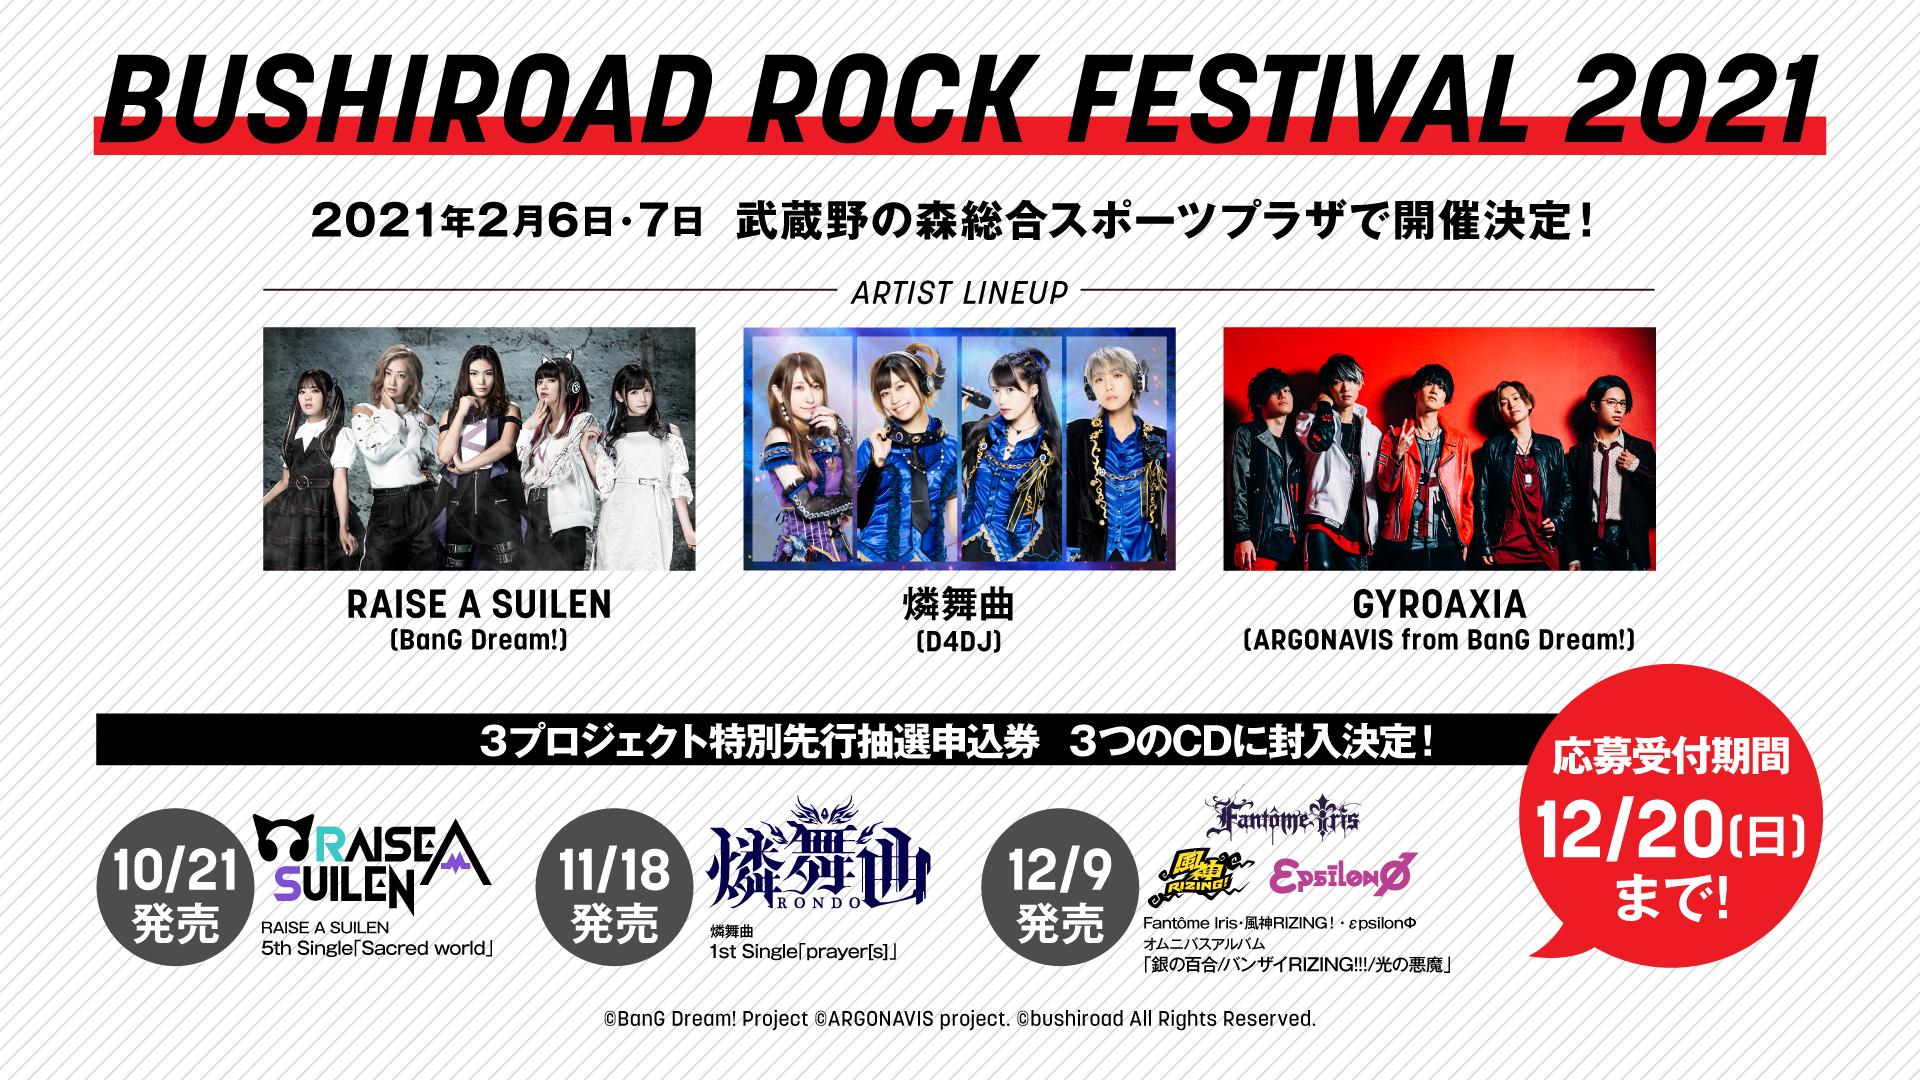 「BUSHIROAD ROCK FESTIVAL 2021」開催決定!